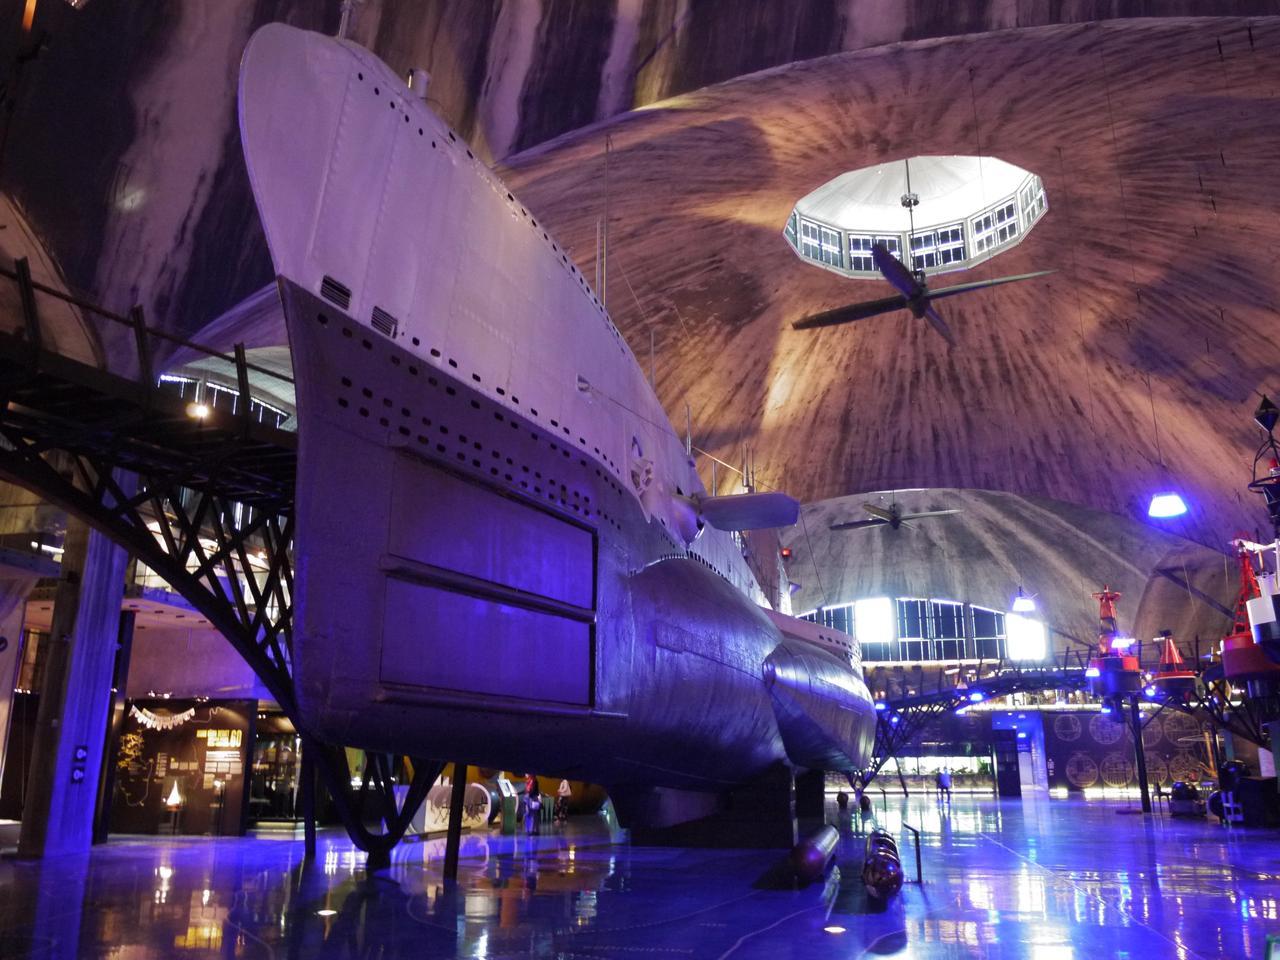 Lembit submarine, built for the Estonian Navy in 1937, now exposed in Estonian Maritime museum in Tallinn